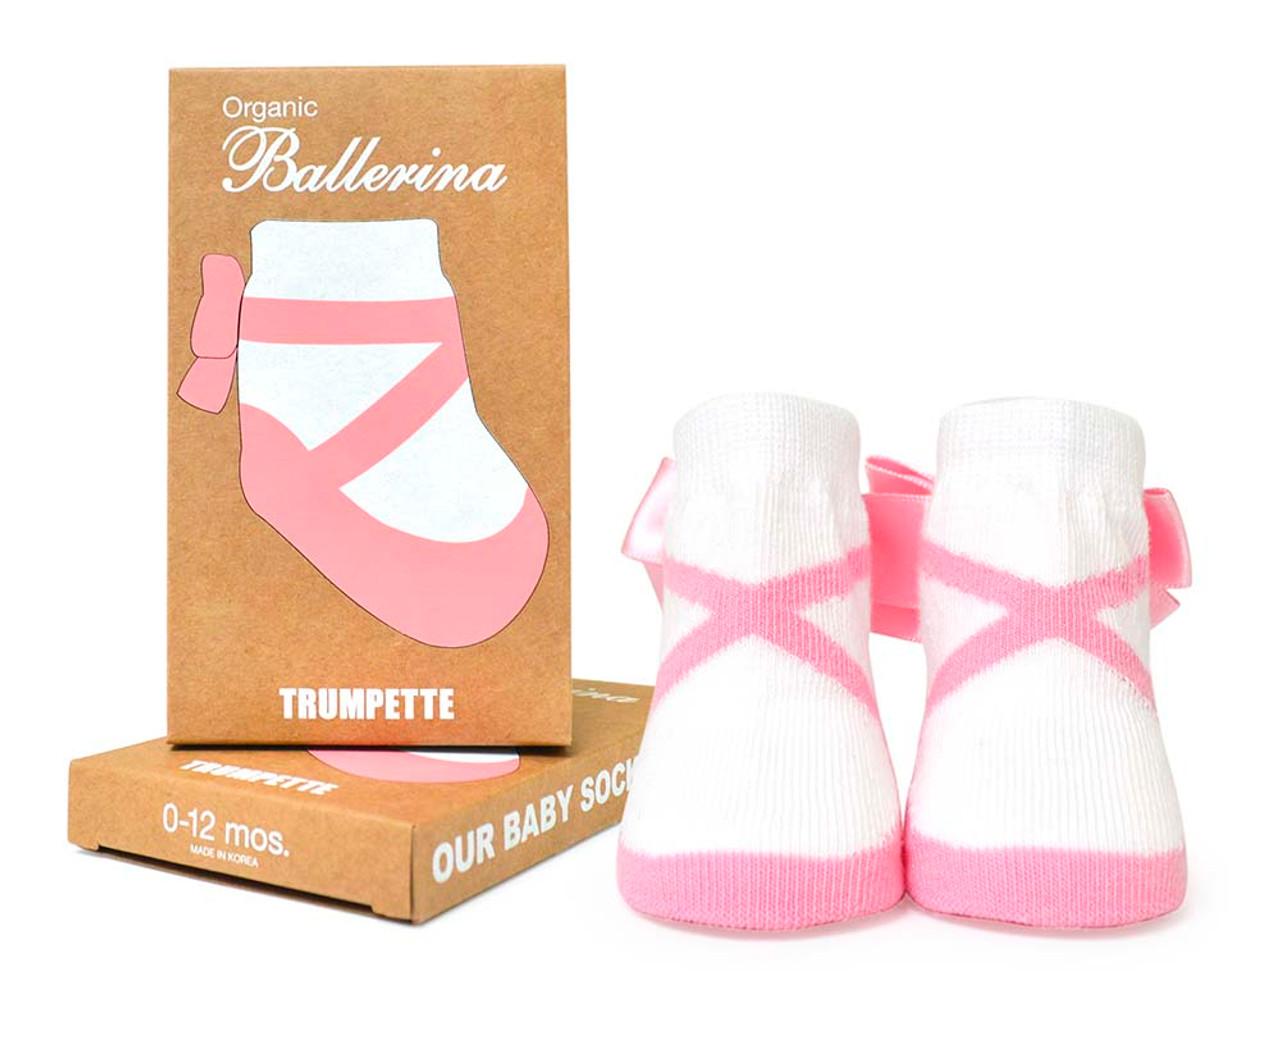 Organic Ballerina Baby Socks, Girls